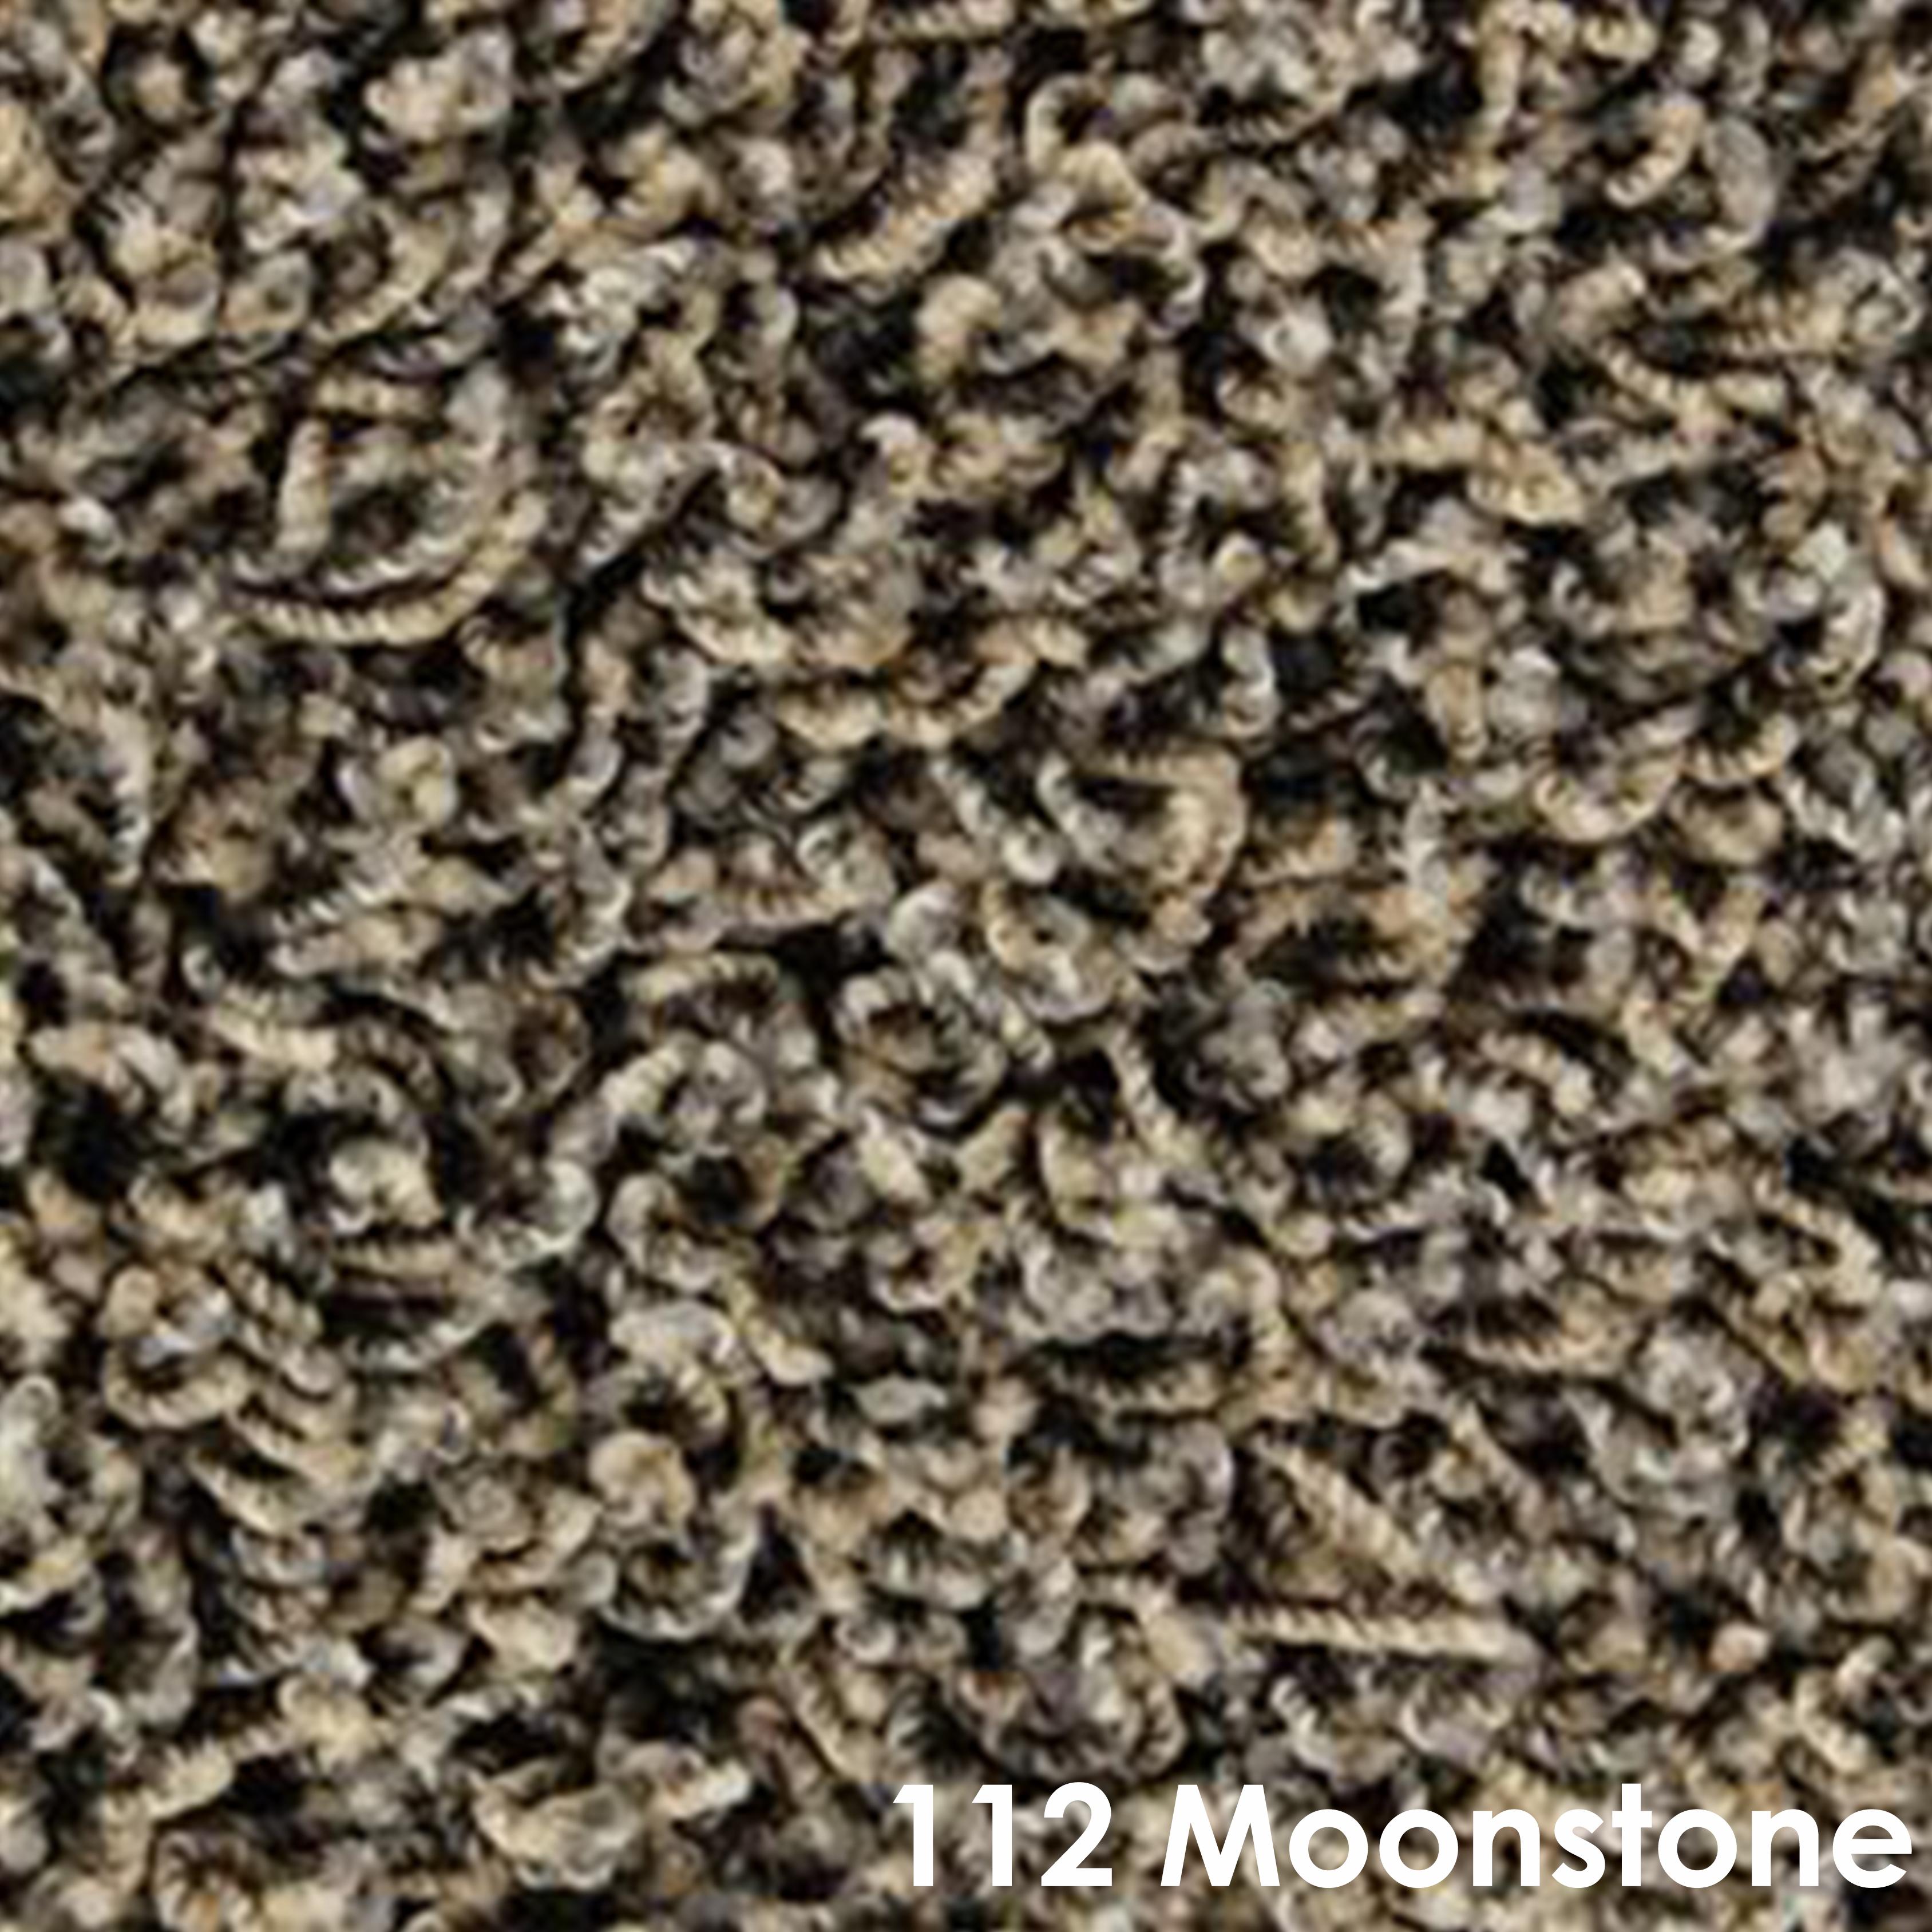 112 Moonstone